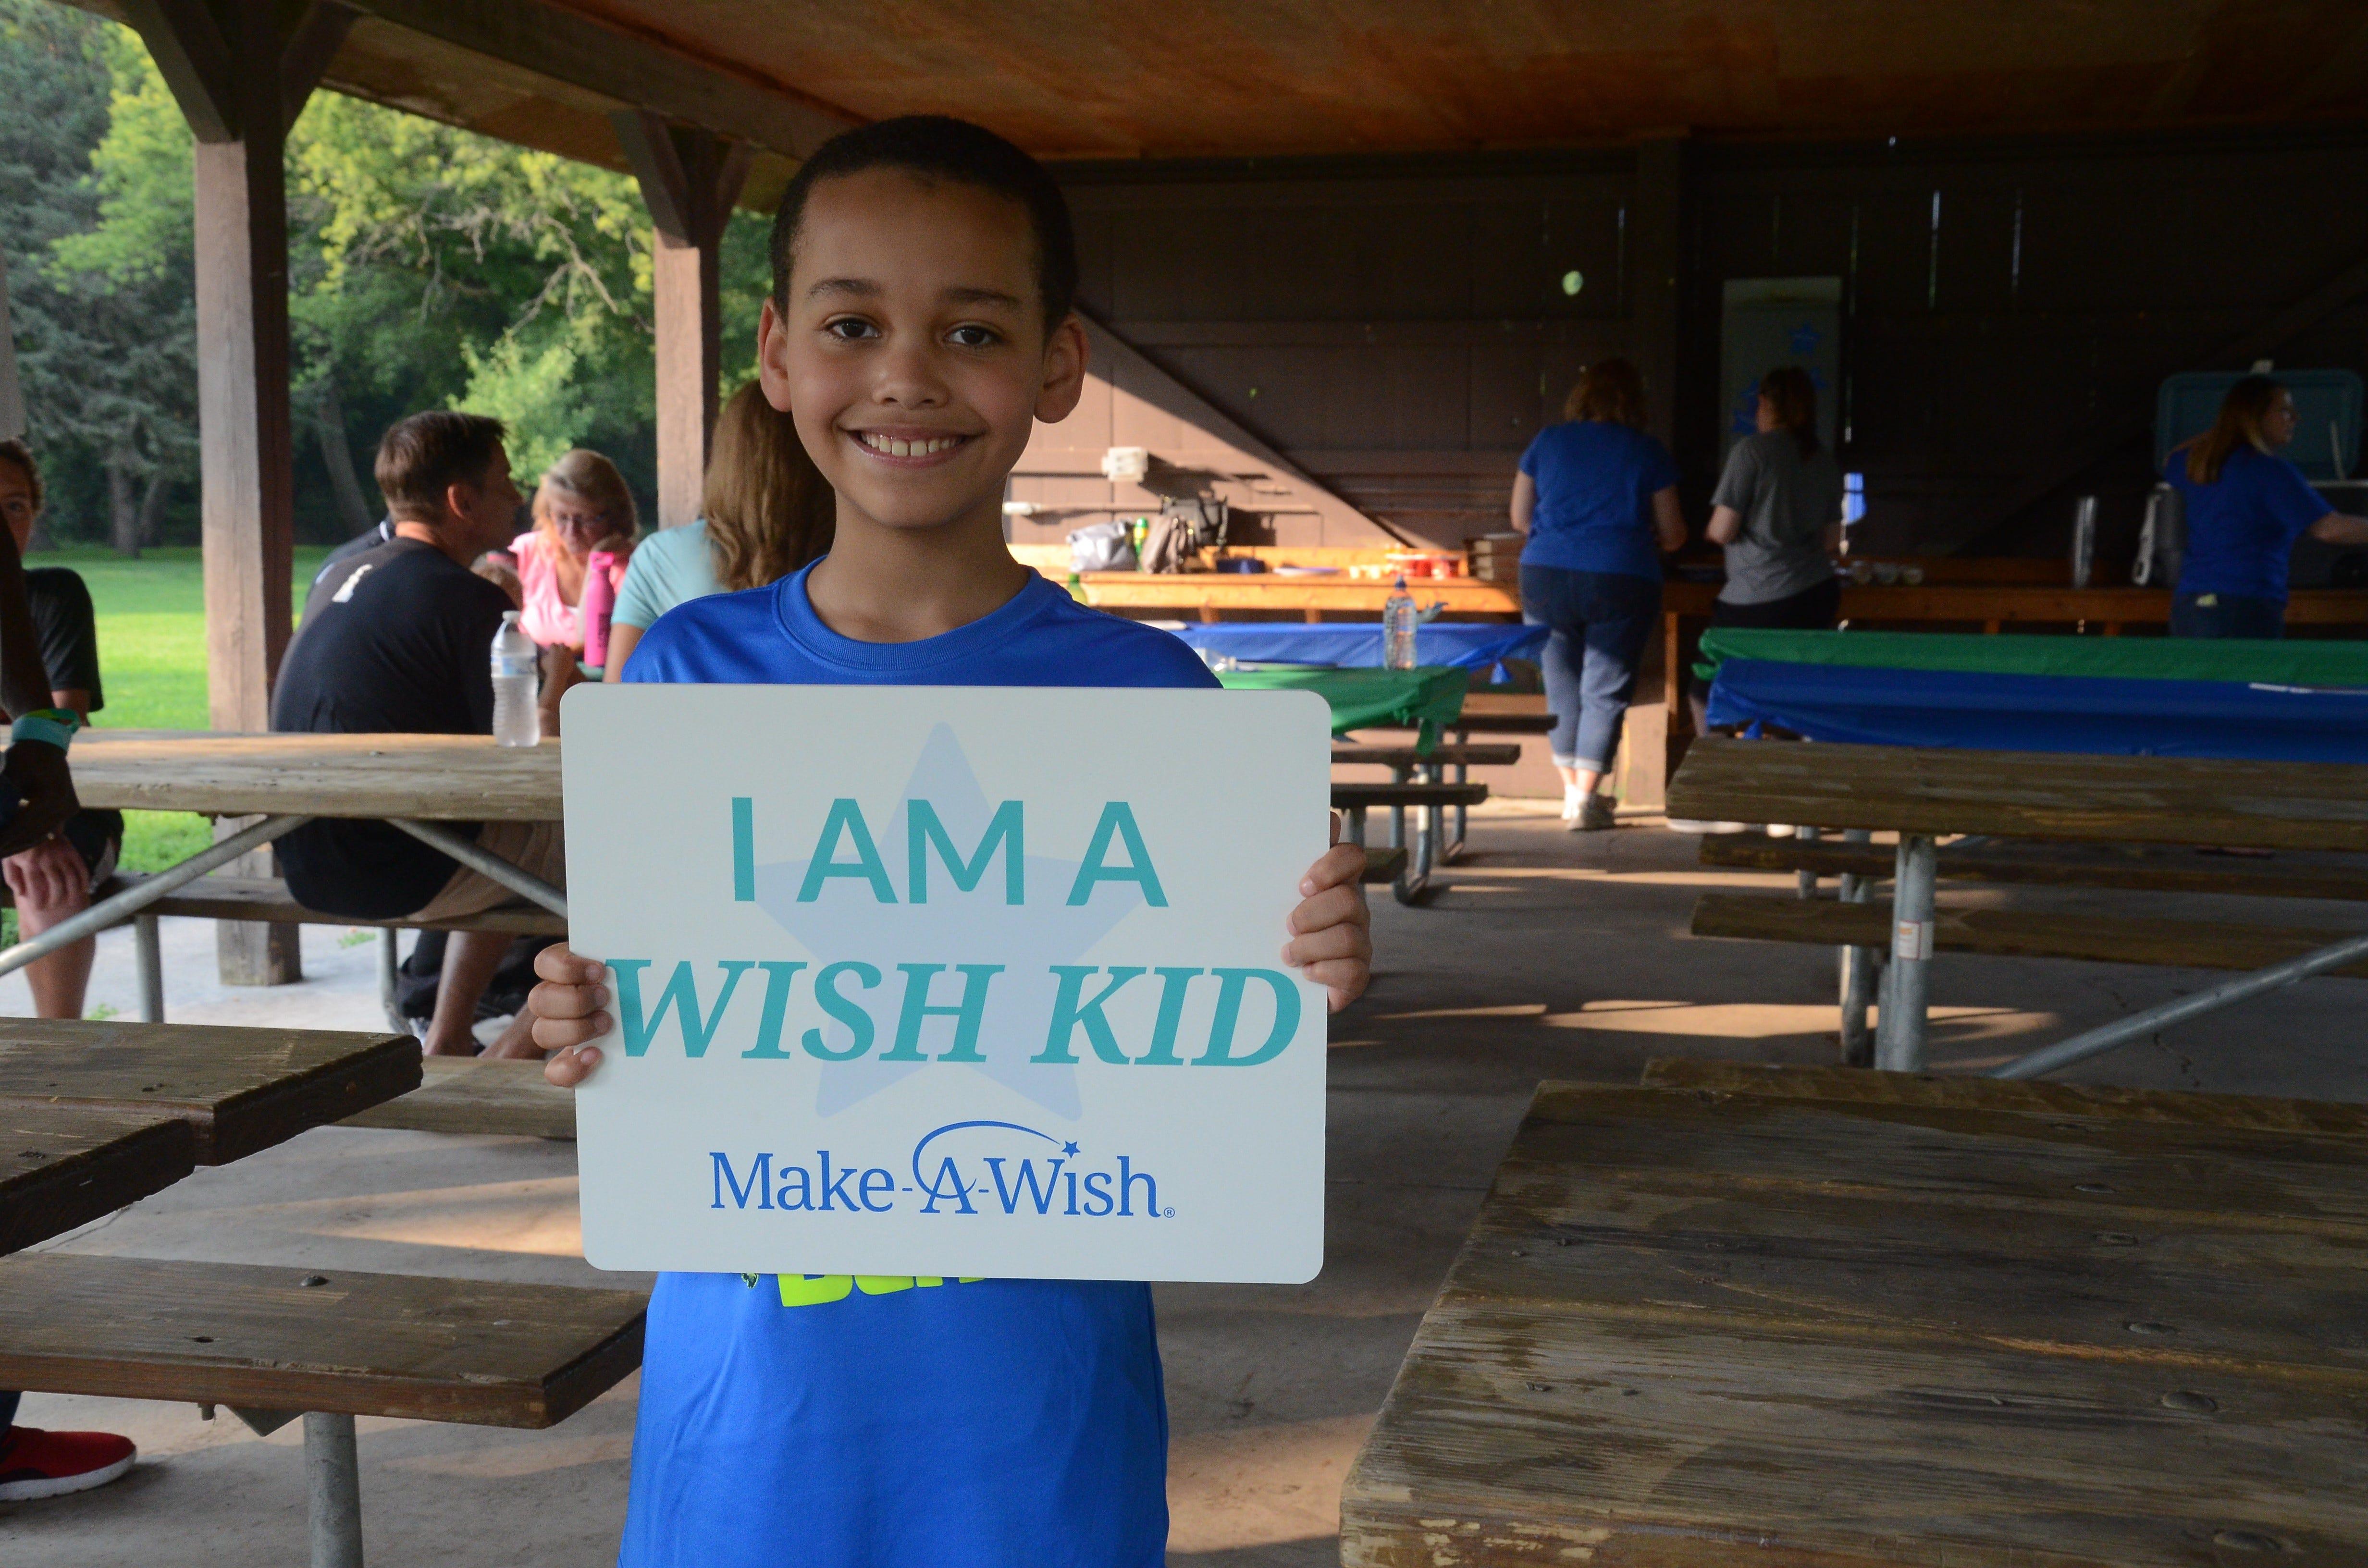 Make-A-Wish gives Jordan Ramazani, 8, a dream shopping trip | Argus Leader